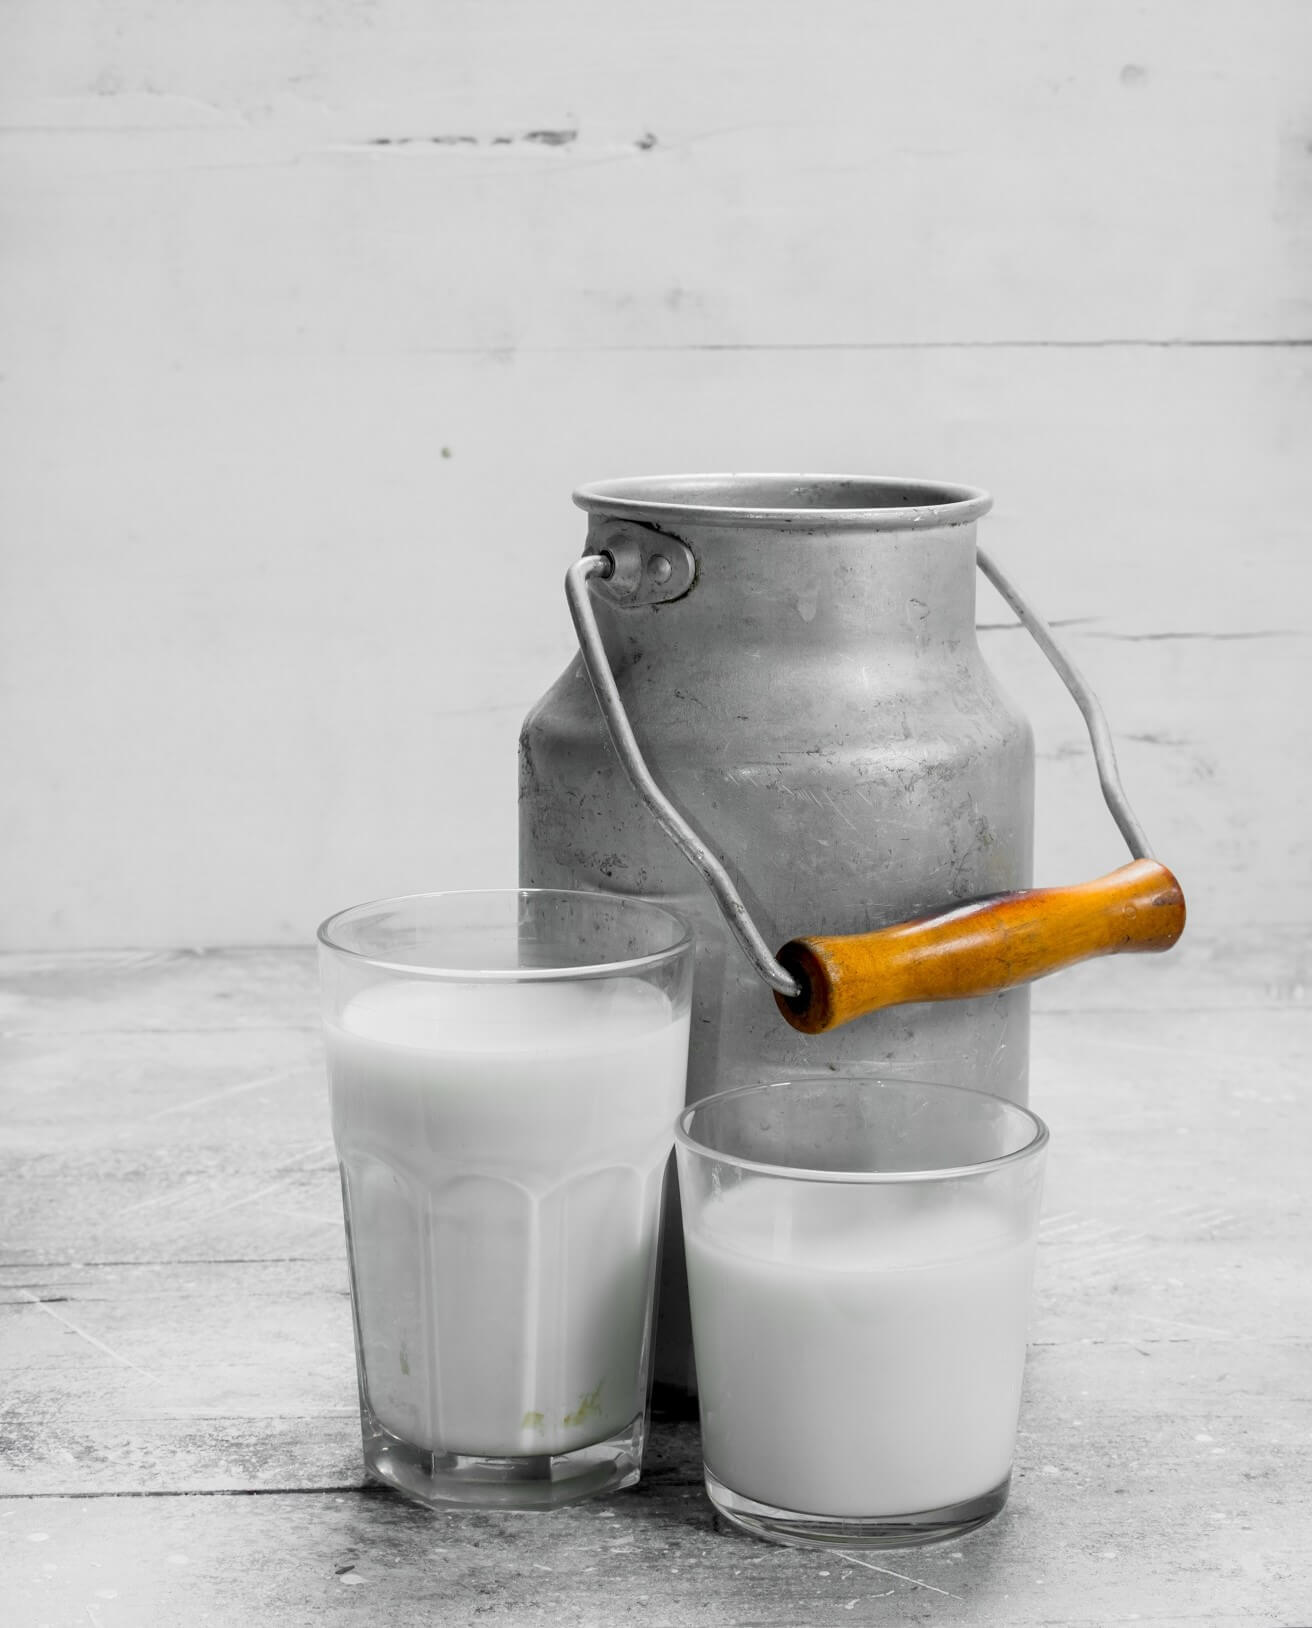 fresh-milk-in-can-on-rustic